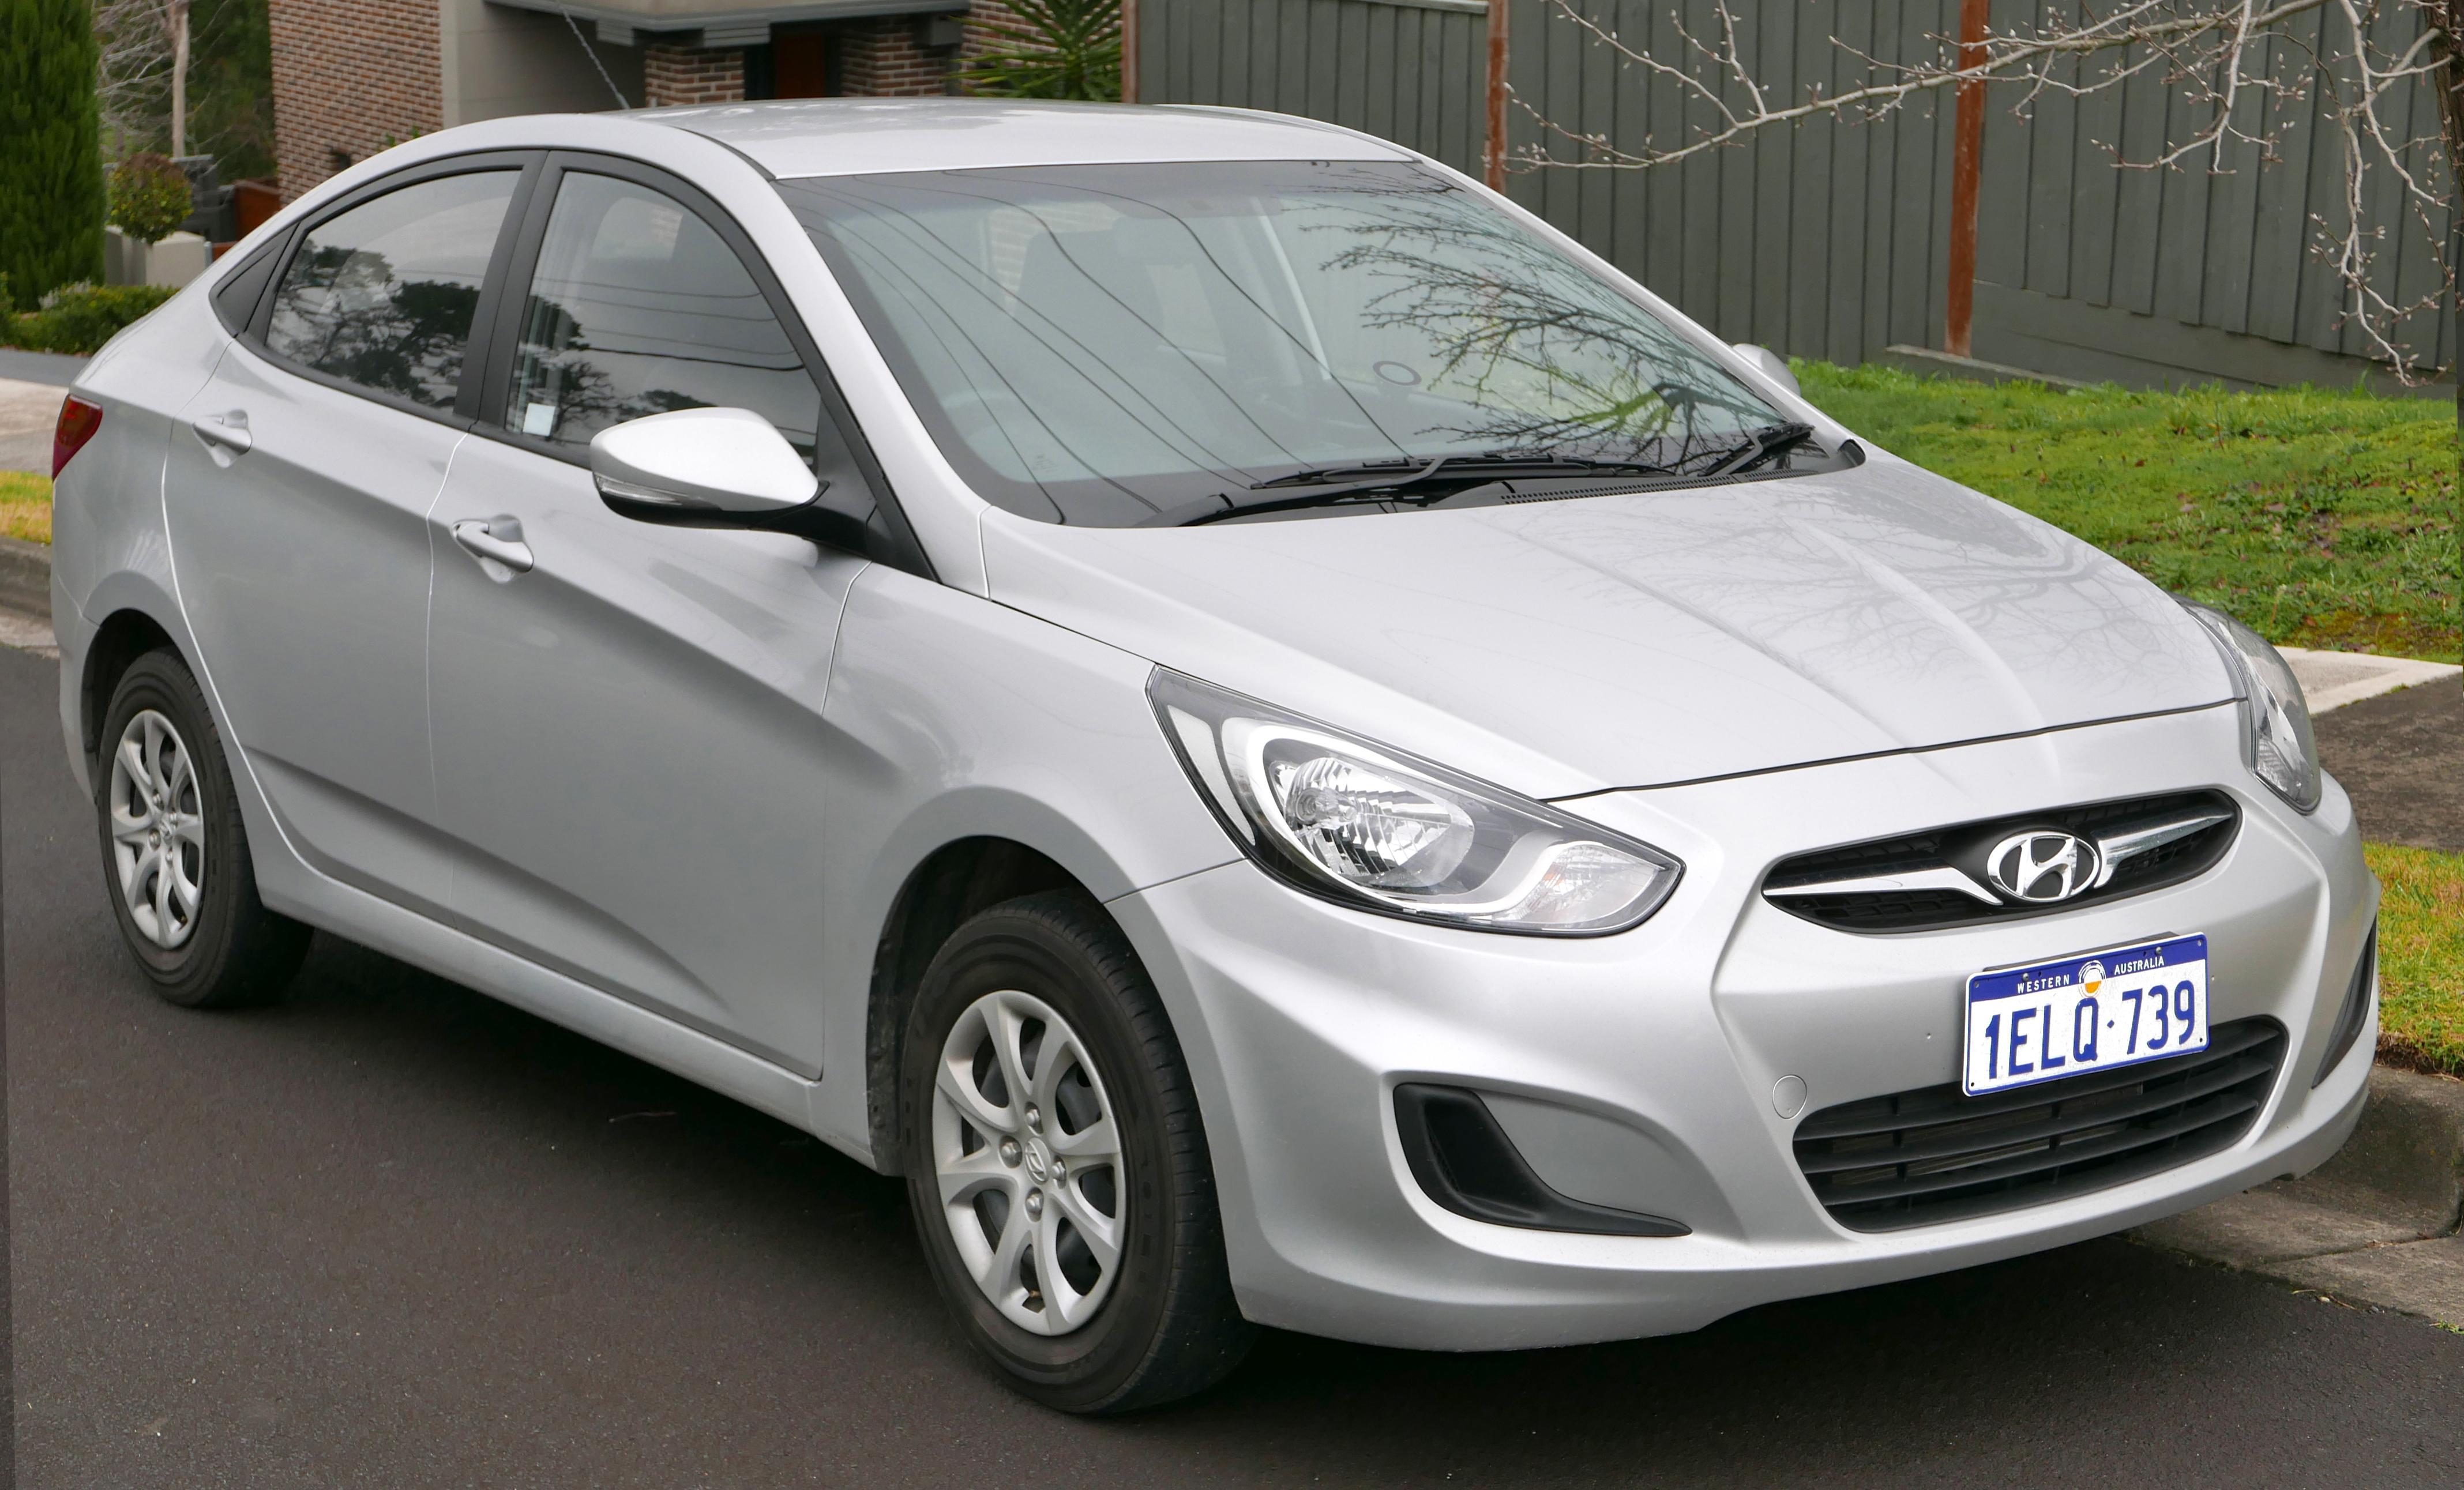 File:2014 Hyundai Accent (RB2 MY14) Active sedan (2015-08-07) 01.jpg